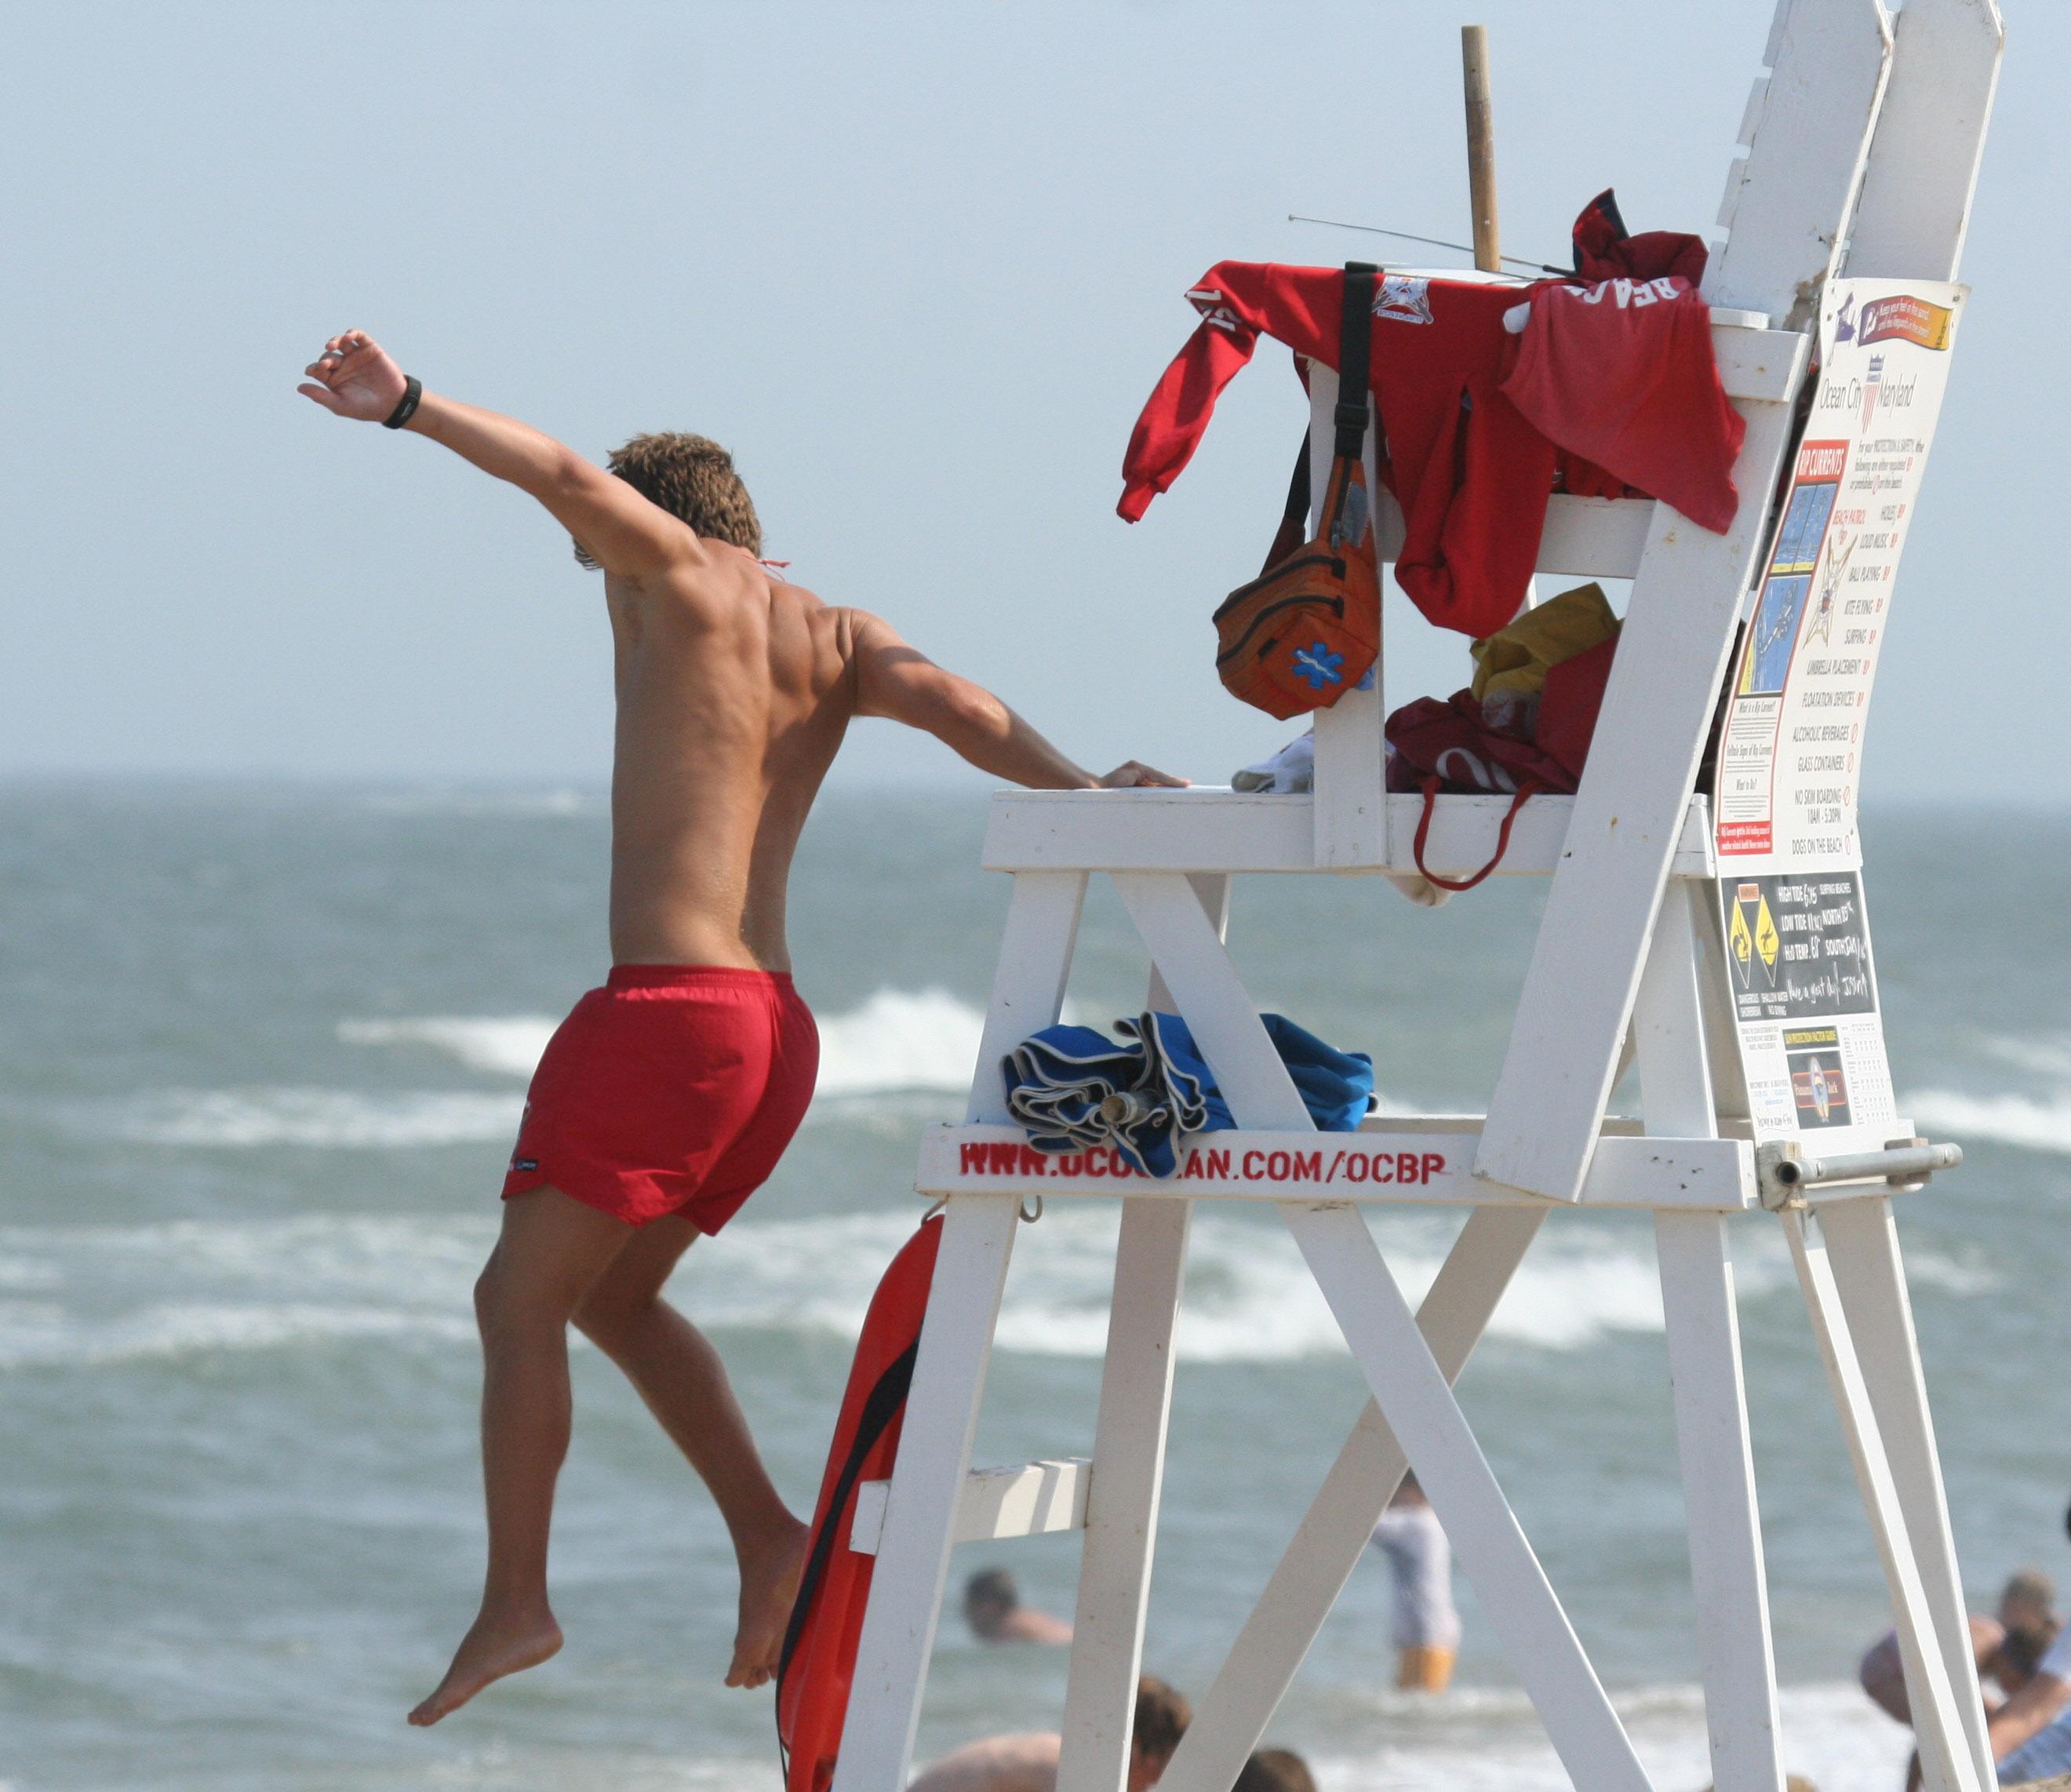 https://i1.wp.com/upload.wikimedia.org/wikipedia/commons/b/b4/Lifeguard_jumping_into_action,_Ocean_City,_June_27_,2007.jpg